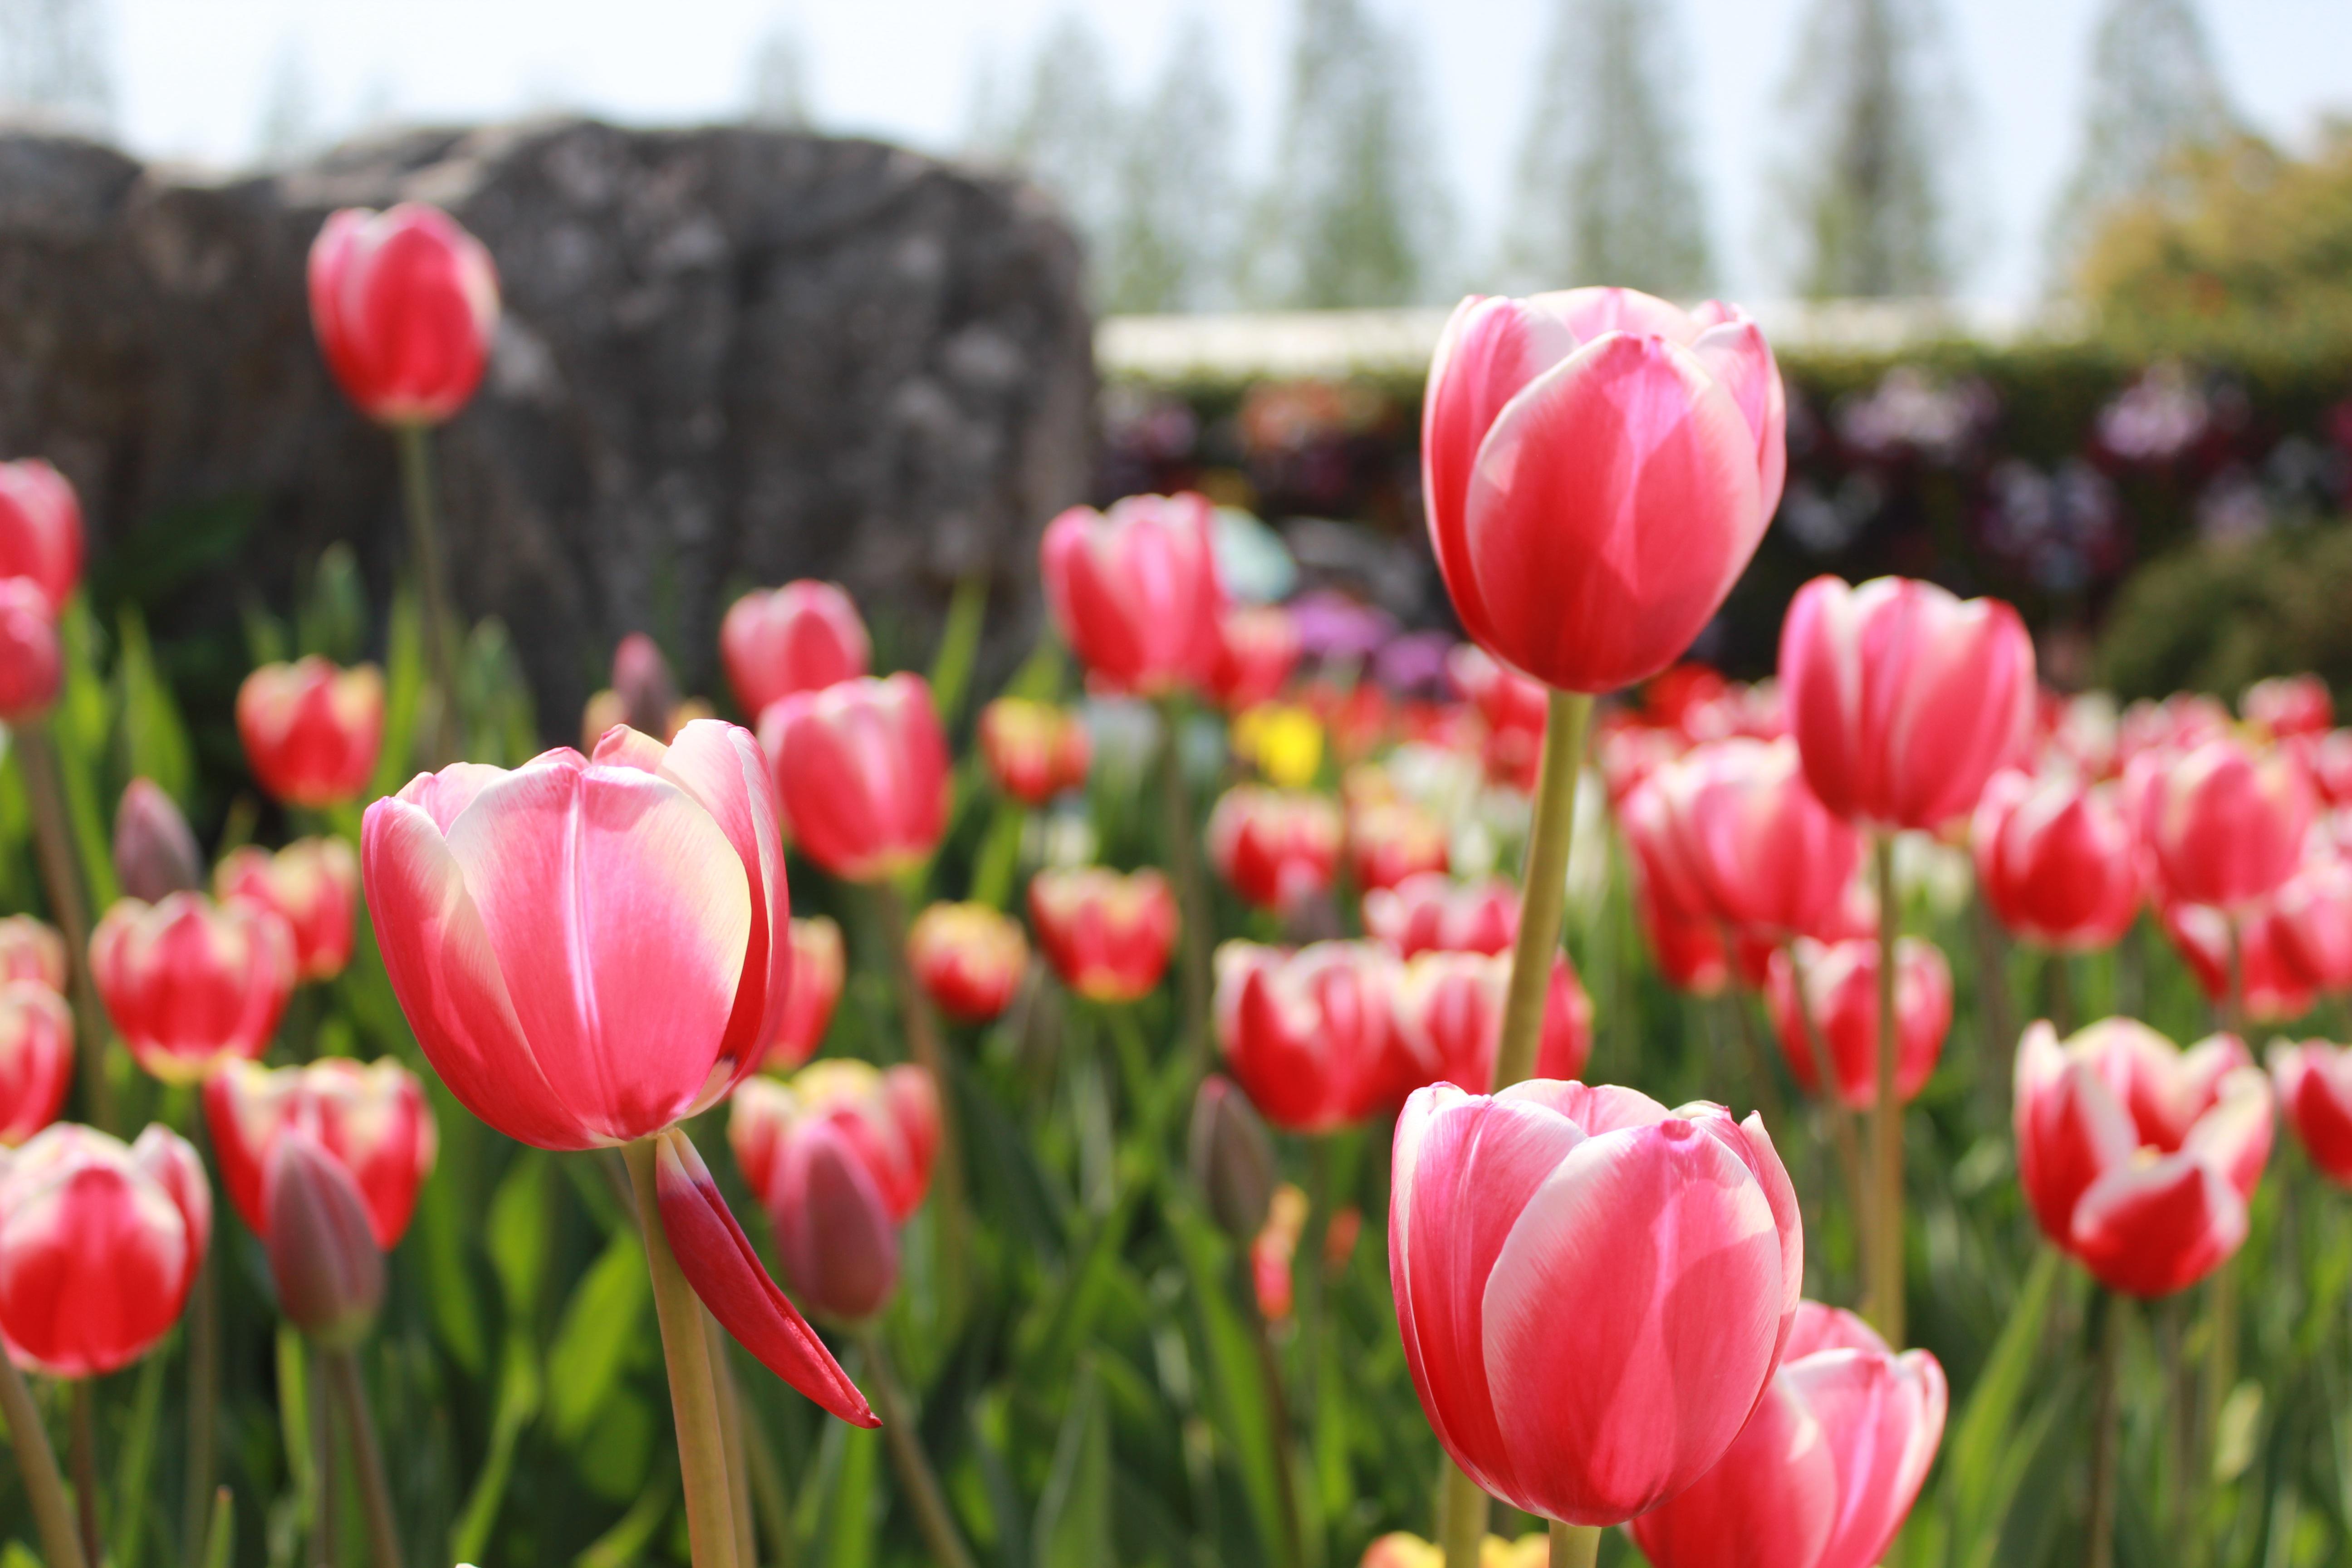 Gratuites paysage la nature pétale tulipe vert